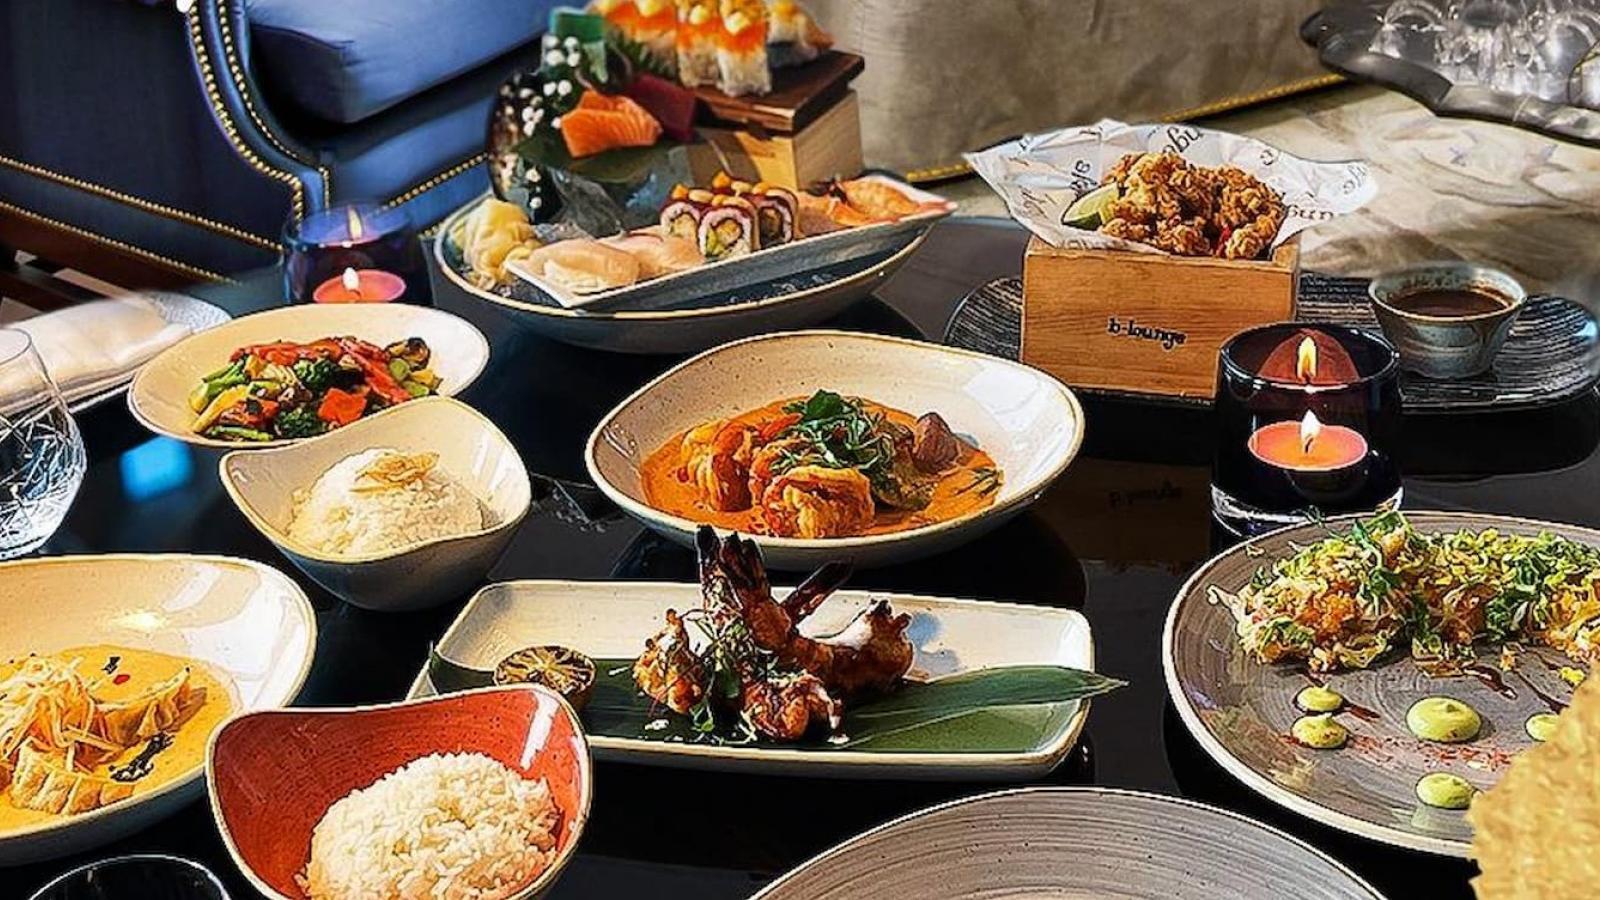 Enjoy a luxurious stay at The Ritz-Carlton this Ramadan